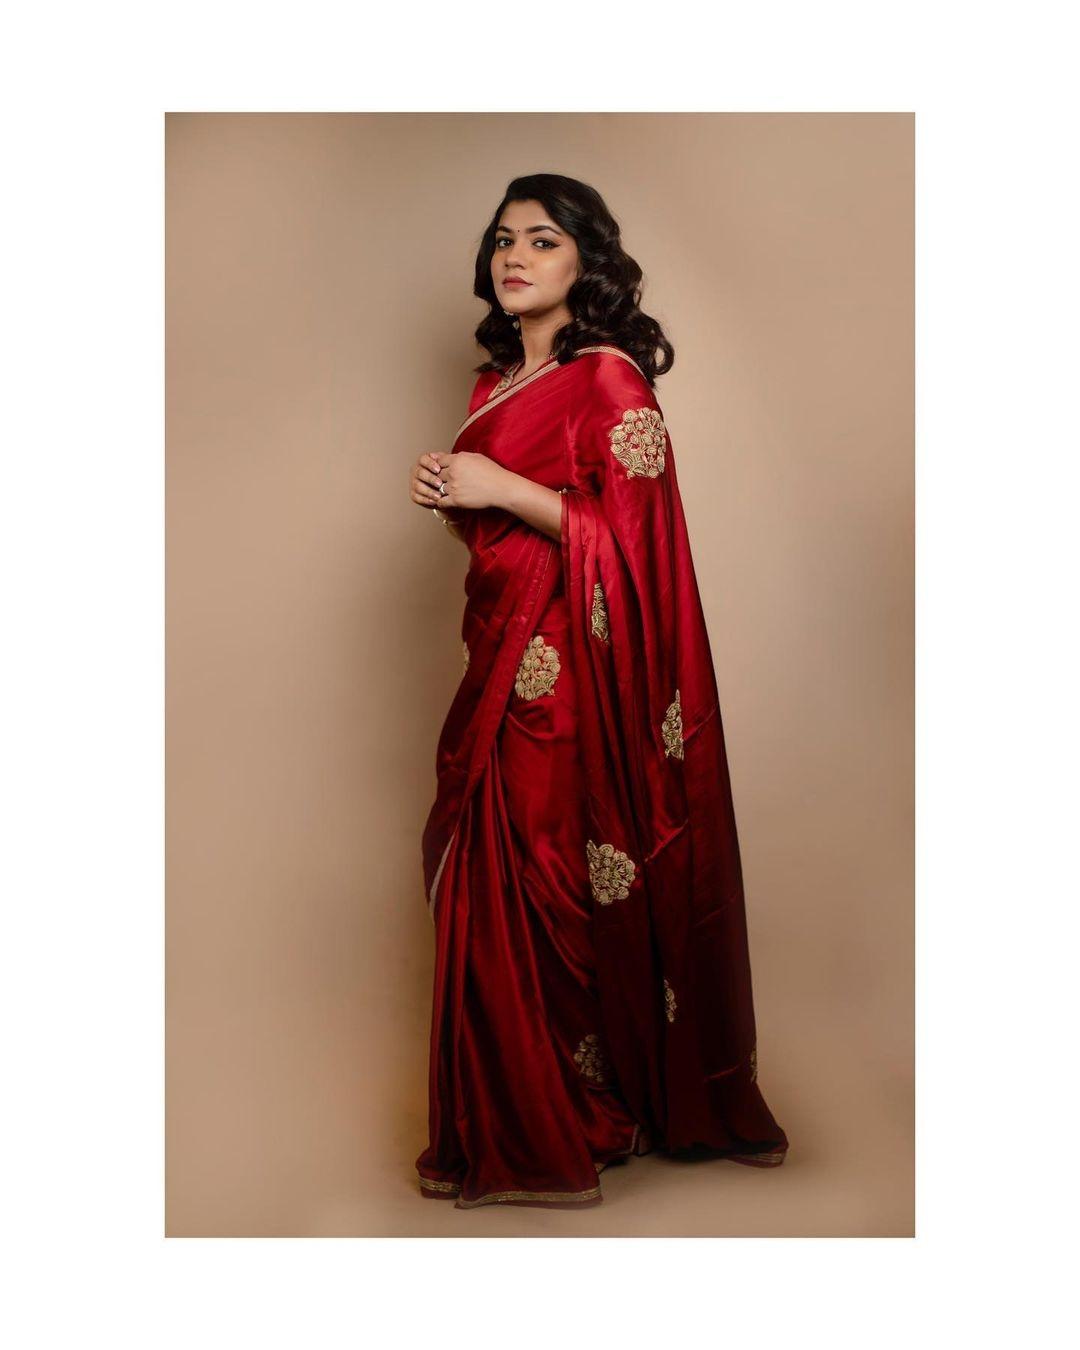 Aparna Balamurali in red raw mango saree for JFW awards